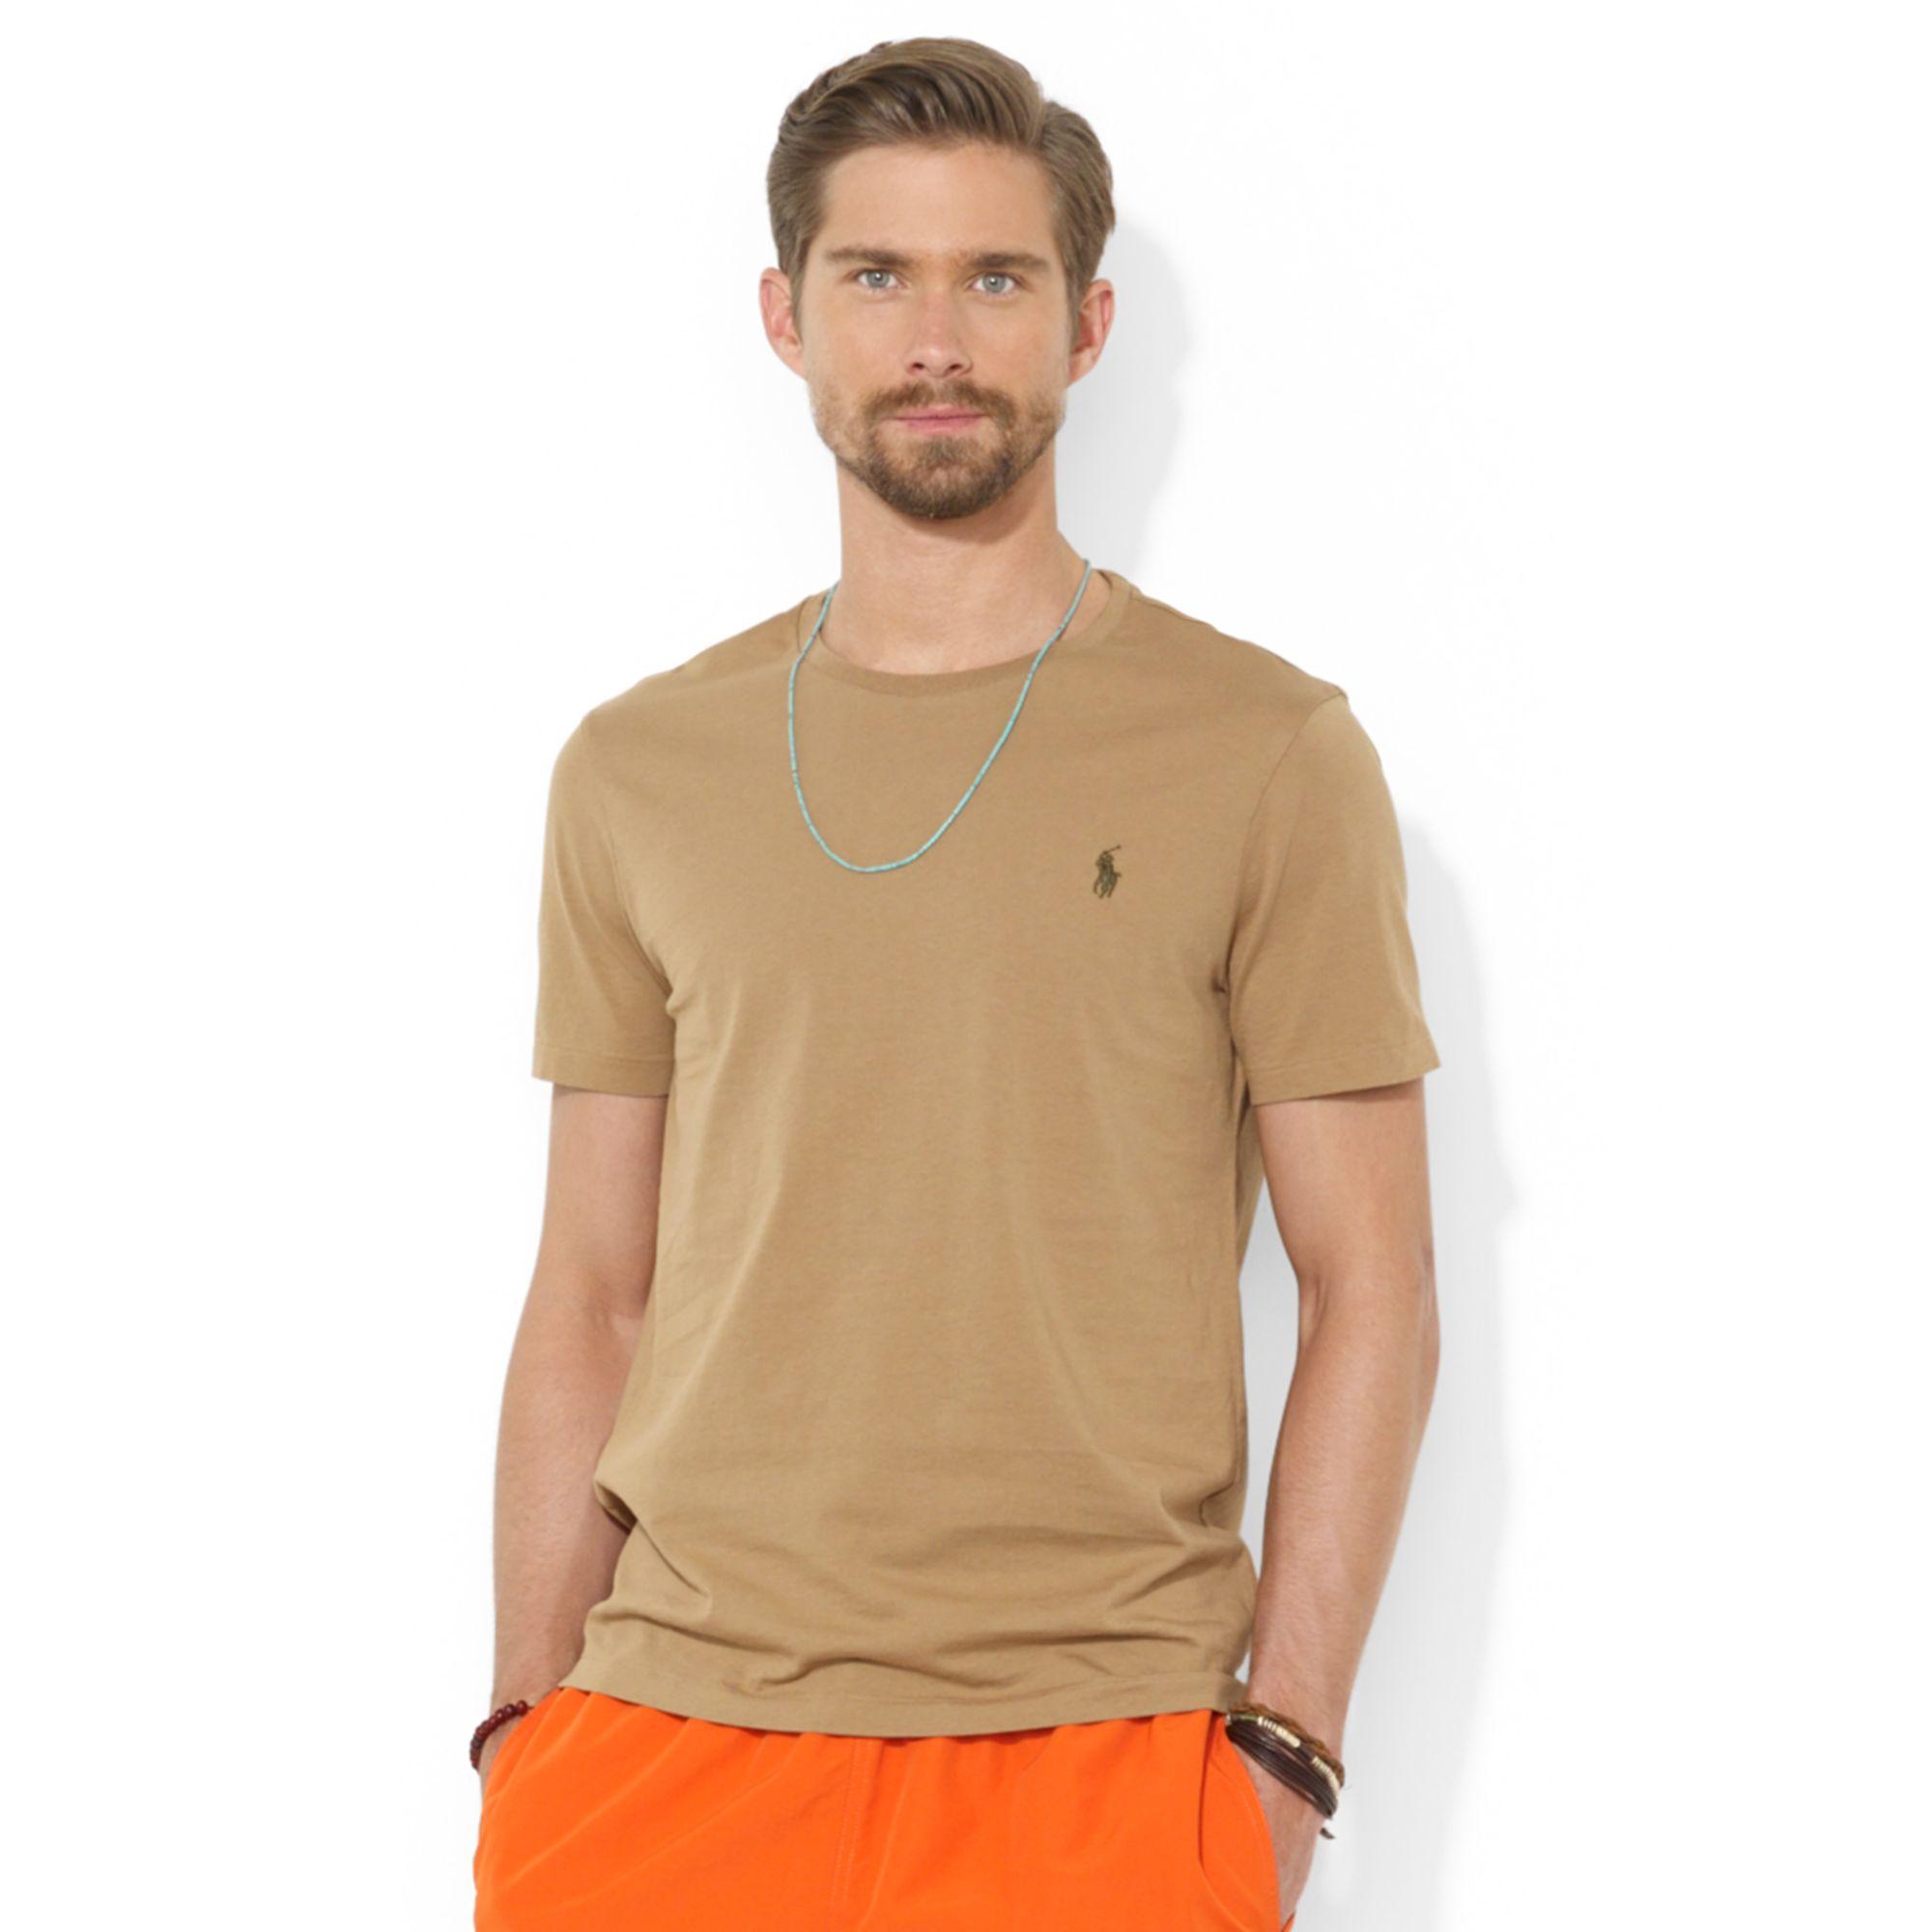 Polo Custom Fit Jersey Shirt Men Ralph T Natural For Lauren Cotton kuOXZiP